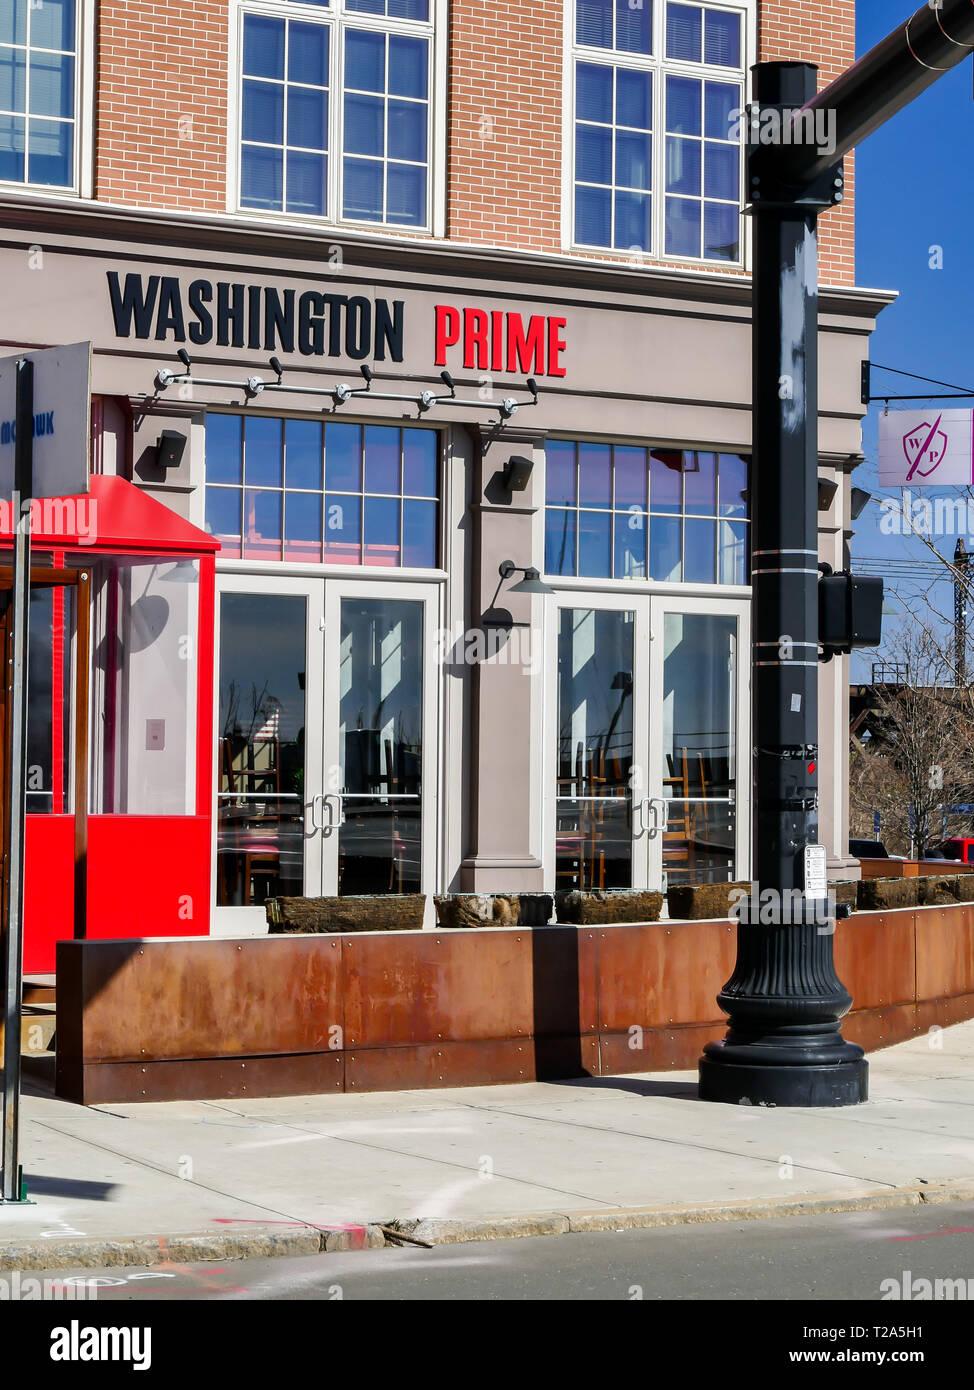 Norwalk Ct Usa March 26 2019 Washington Prime